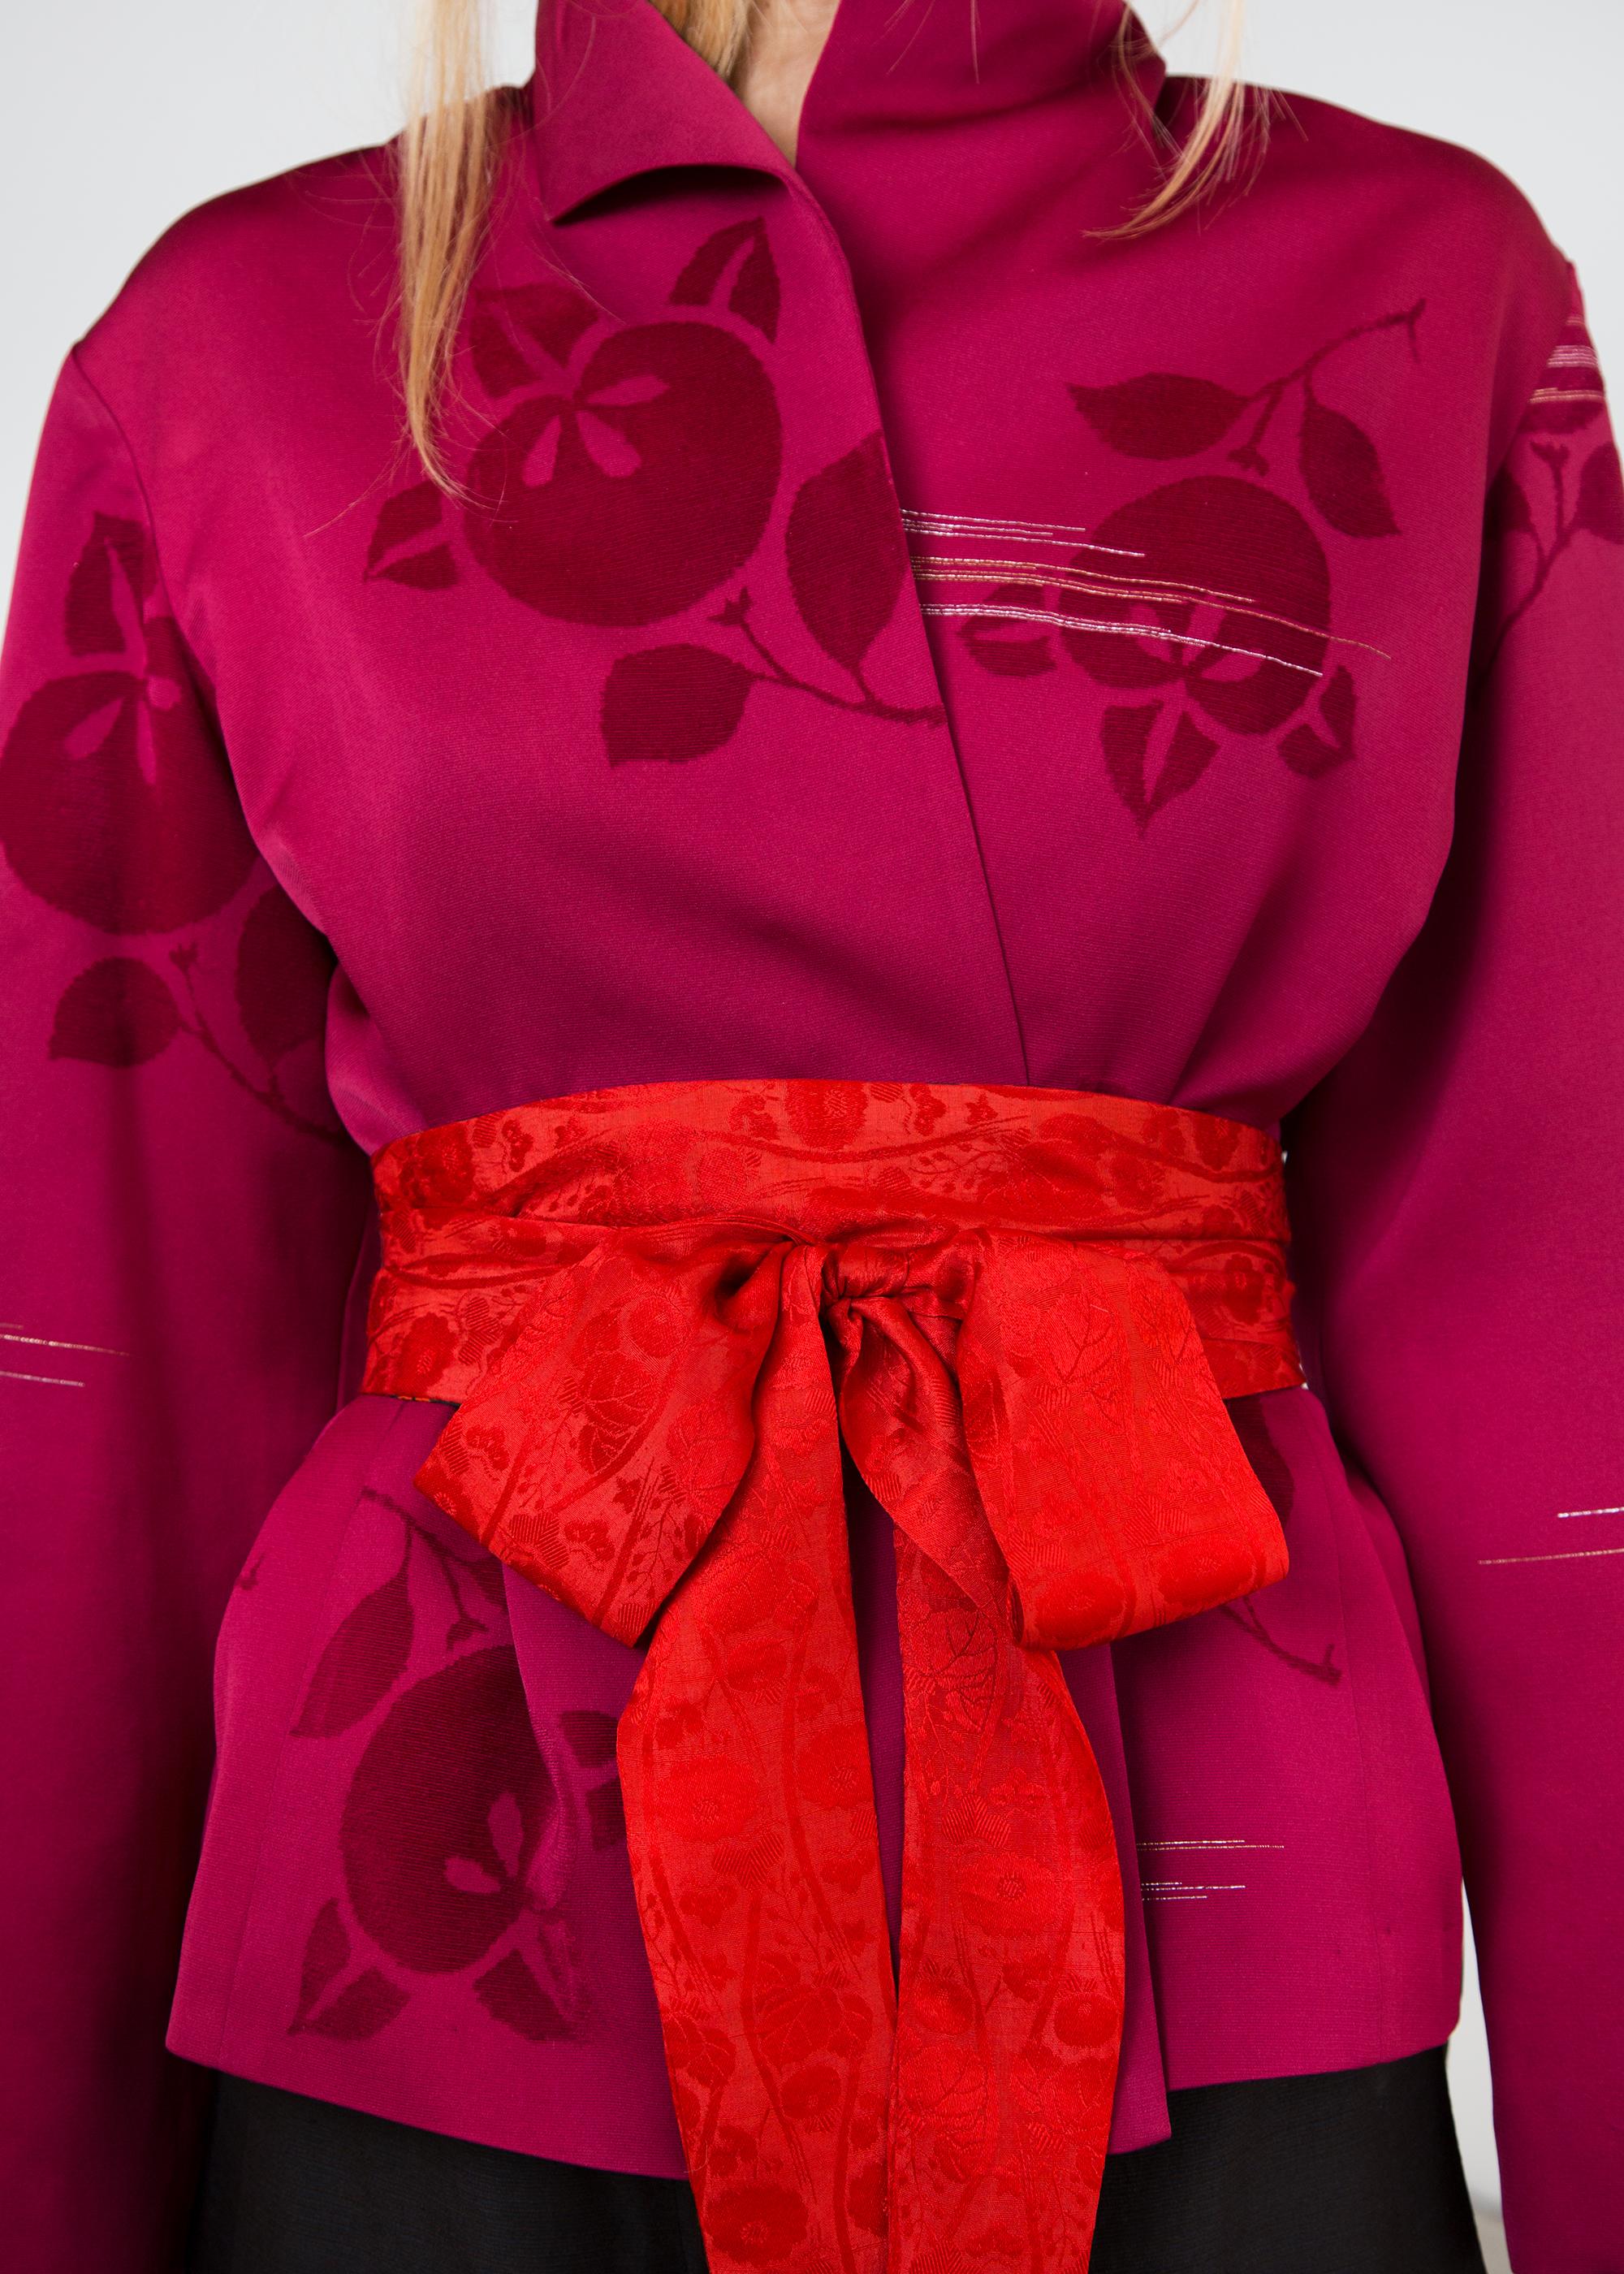 Wrap Belt in Vintage Red Silk Damask Reversing to Red and Black Silk Shibori (SOLD)